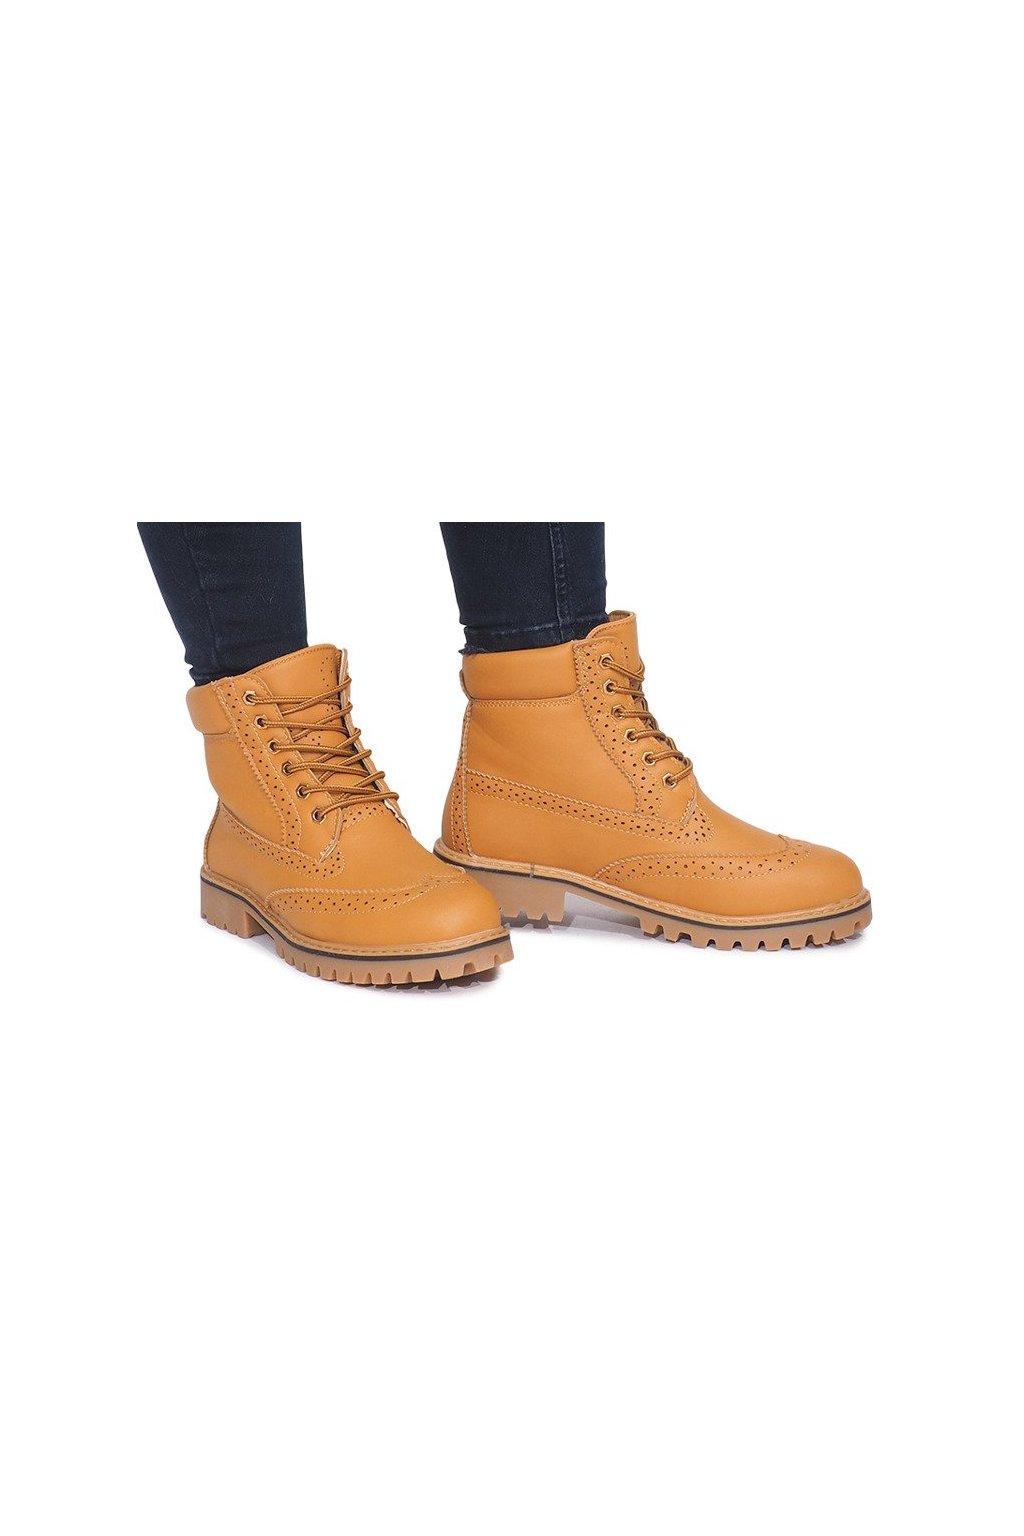 Dámske členkové topánky trapery hnedé kód BH92-KB - GM